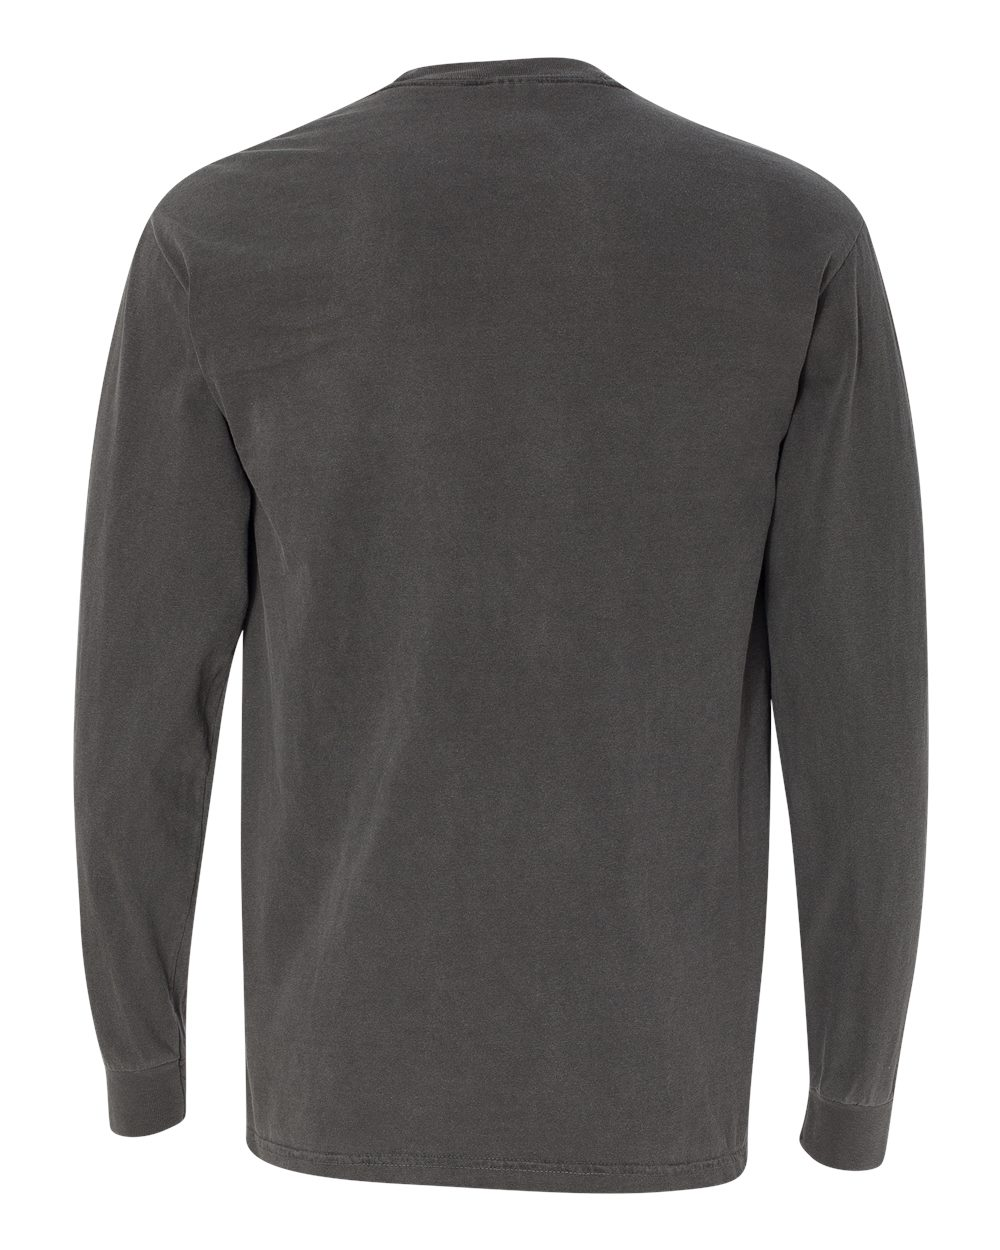 Comfort-Colors-Men-039-s-6-1-oz-Long-Sleeve-Pocket-T-Shirt-C4410-S-3XL thumbnail 33